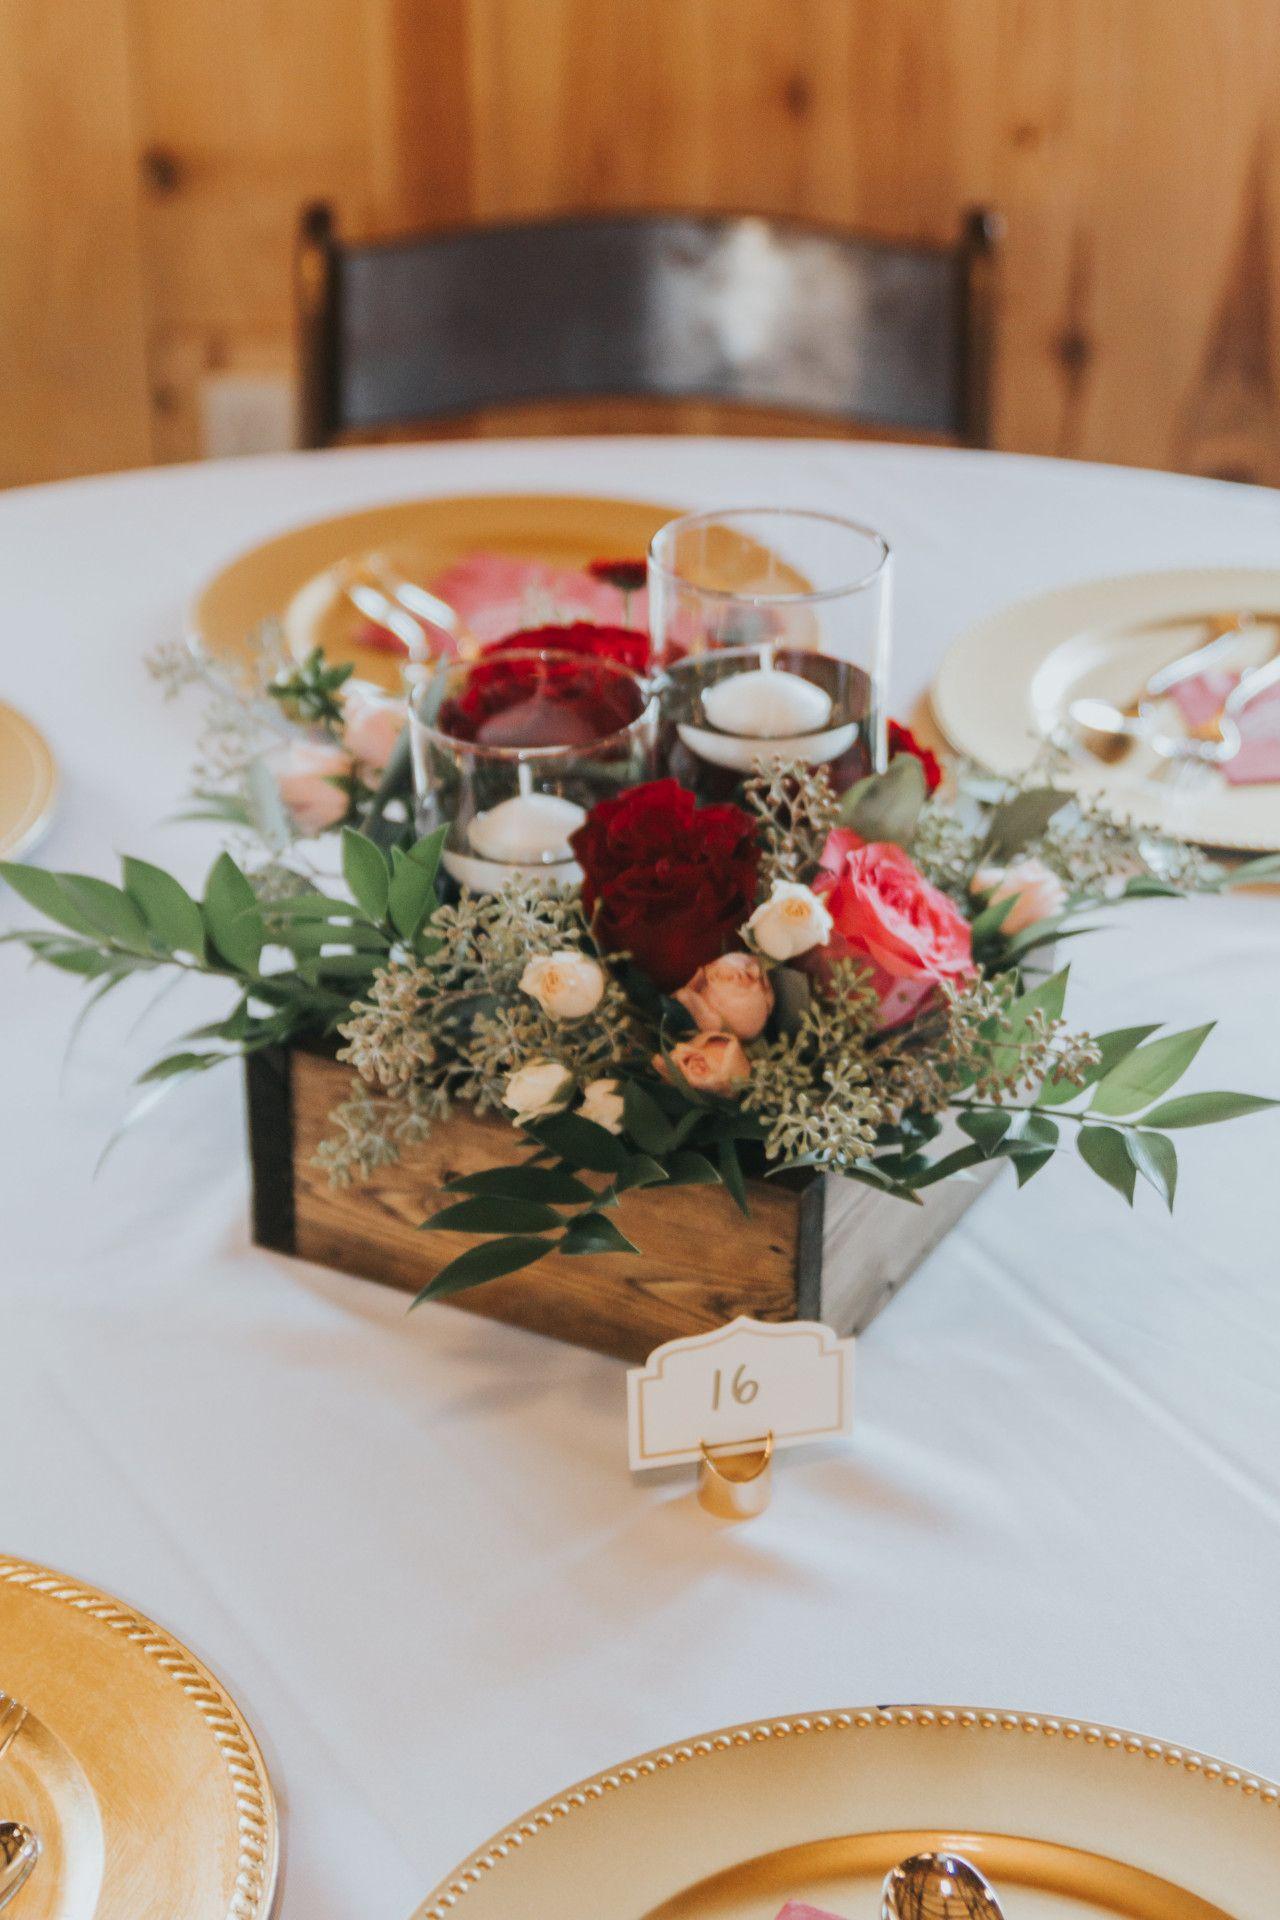 Modern Rustic Wedding Decor Modern Rustic Wedding Table Centerpiece Red Small Wedding Centerpieces Rustic Red Wedding Wedding Table Centerpieces Rustic